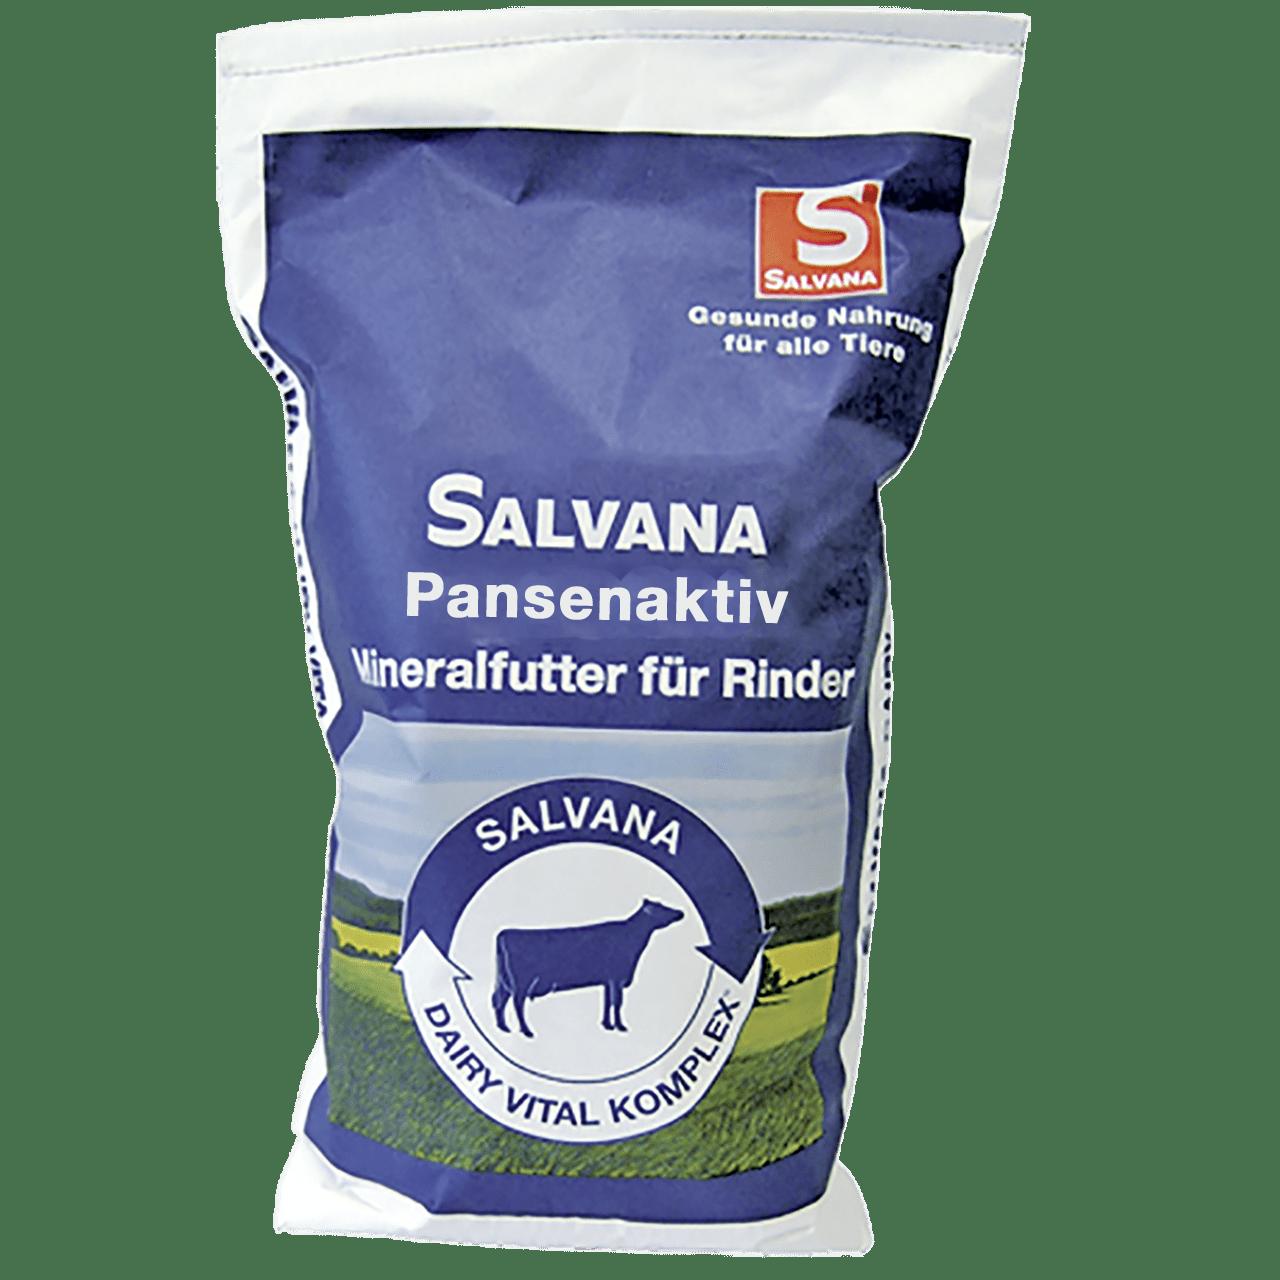 SALVANA Pansenaktiv